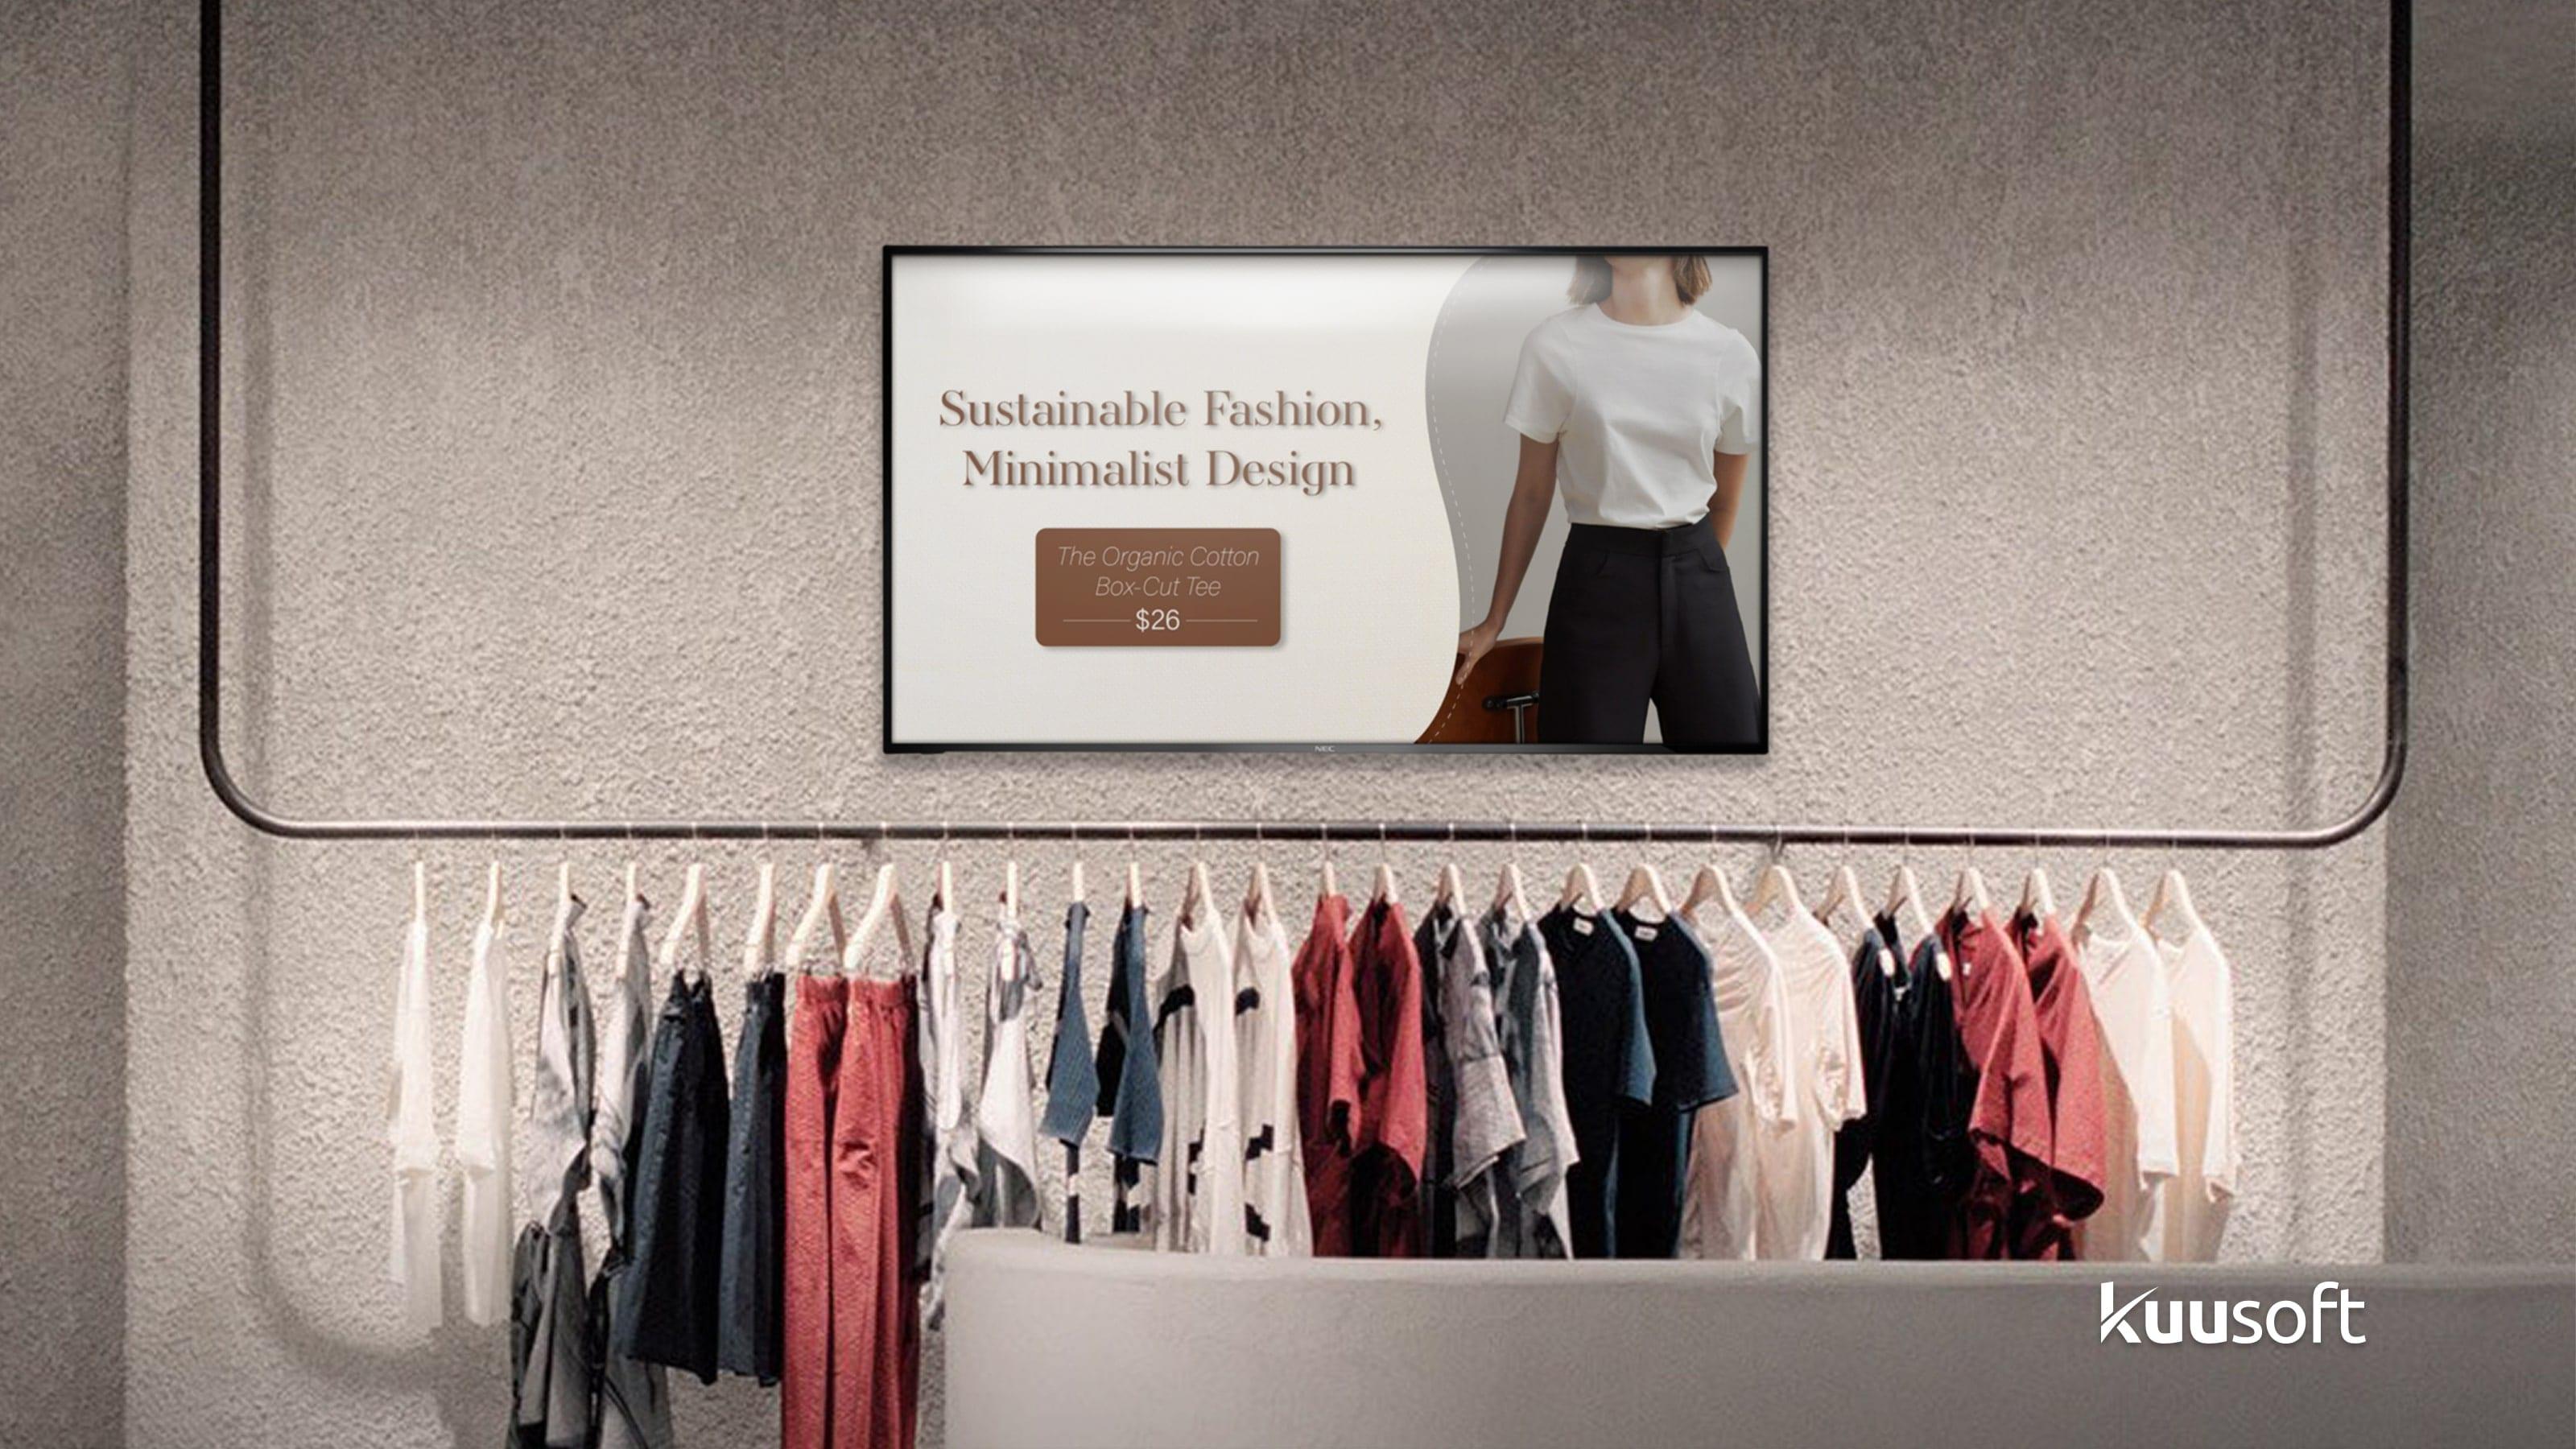 Retail digital signage for Sustainable Fashion, Minimalist Design The Organic Cotton Box-Cut Tee $26